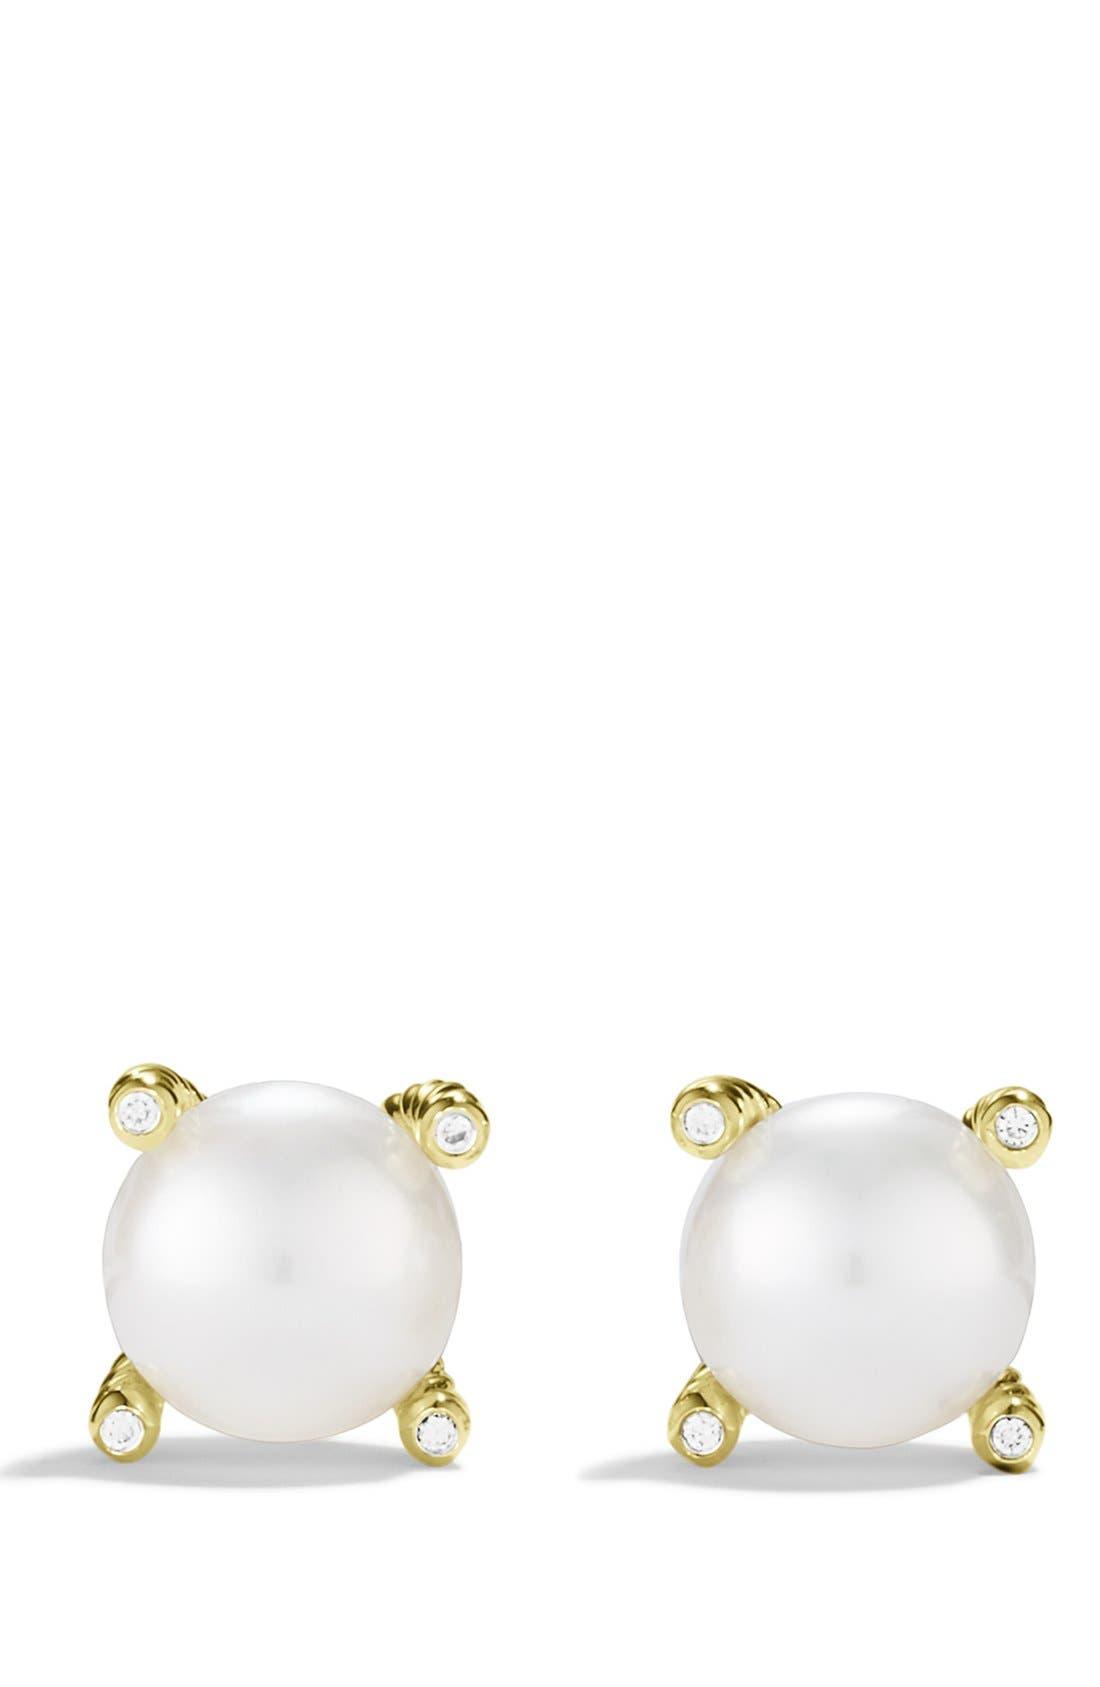 Alternate Image 2  - David Yurman Pearl Earrings with Diamonds in Gold